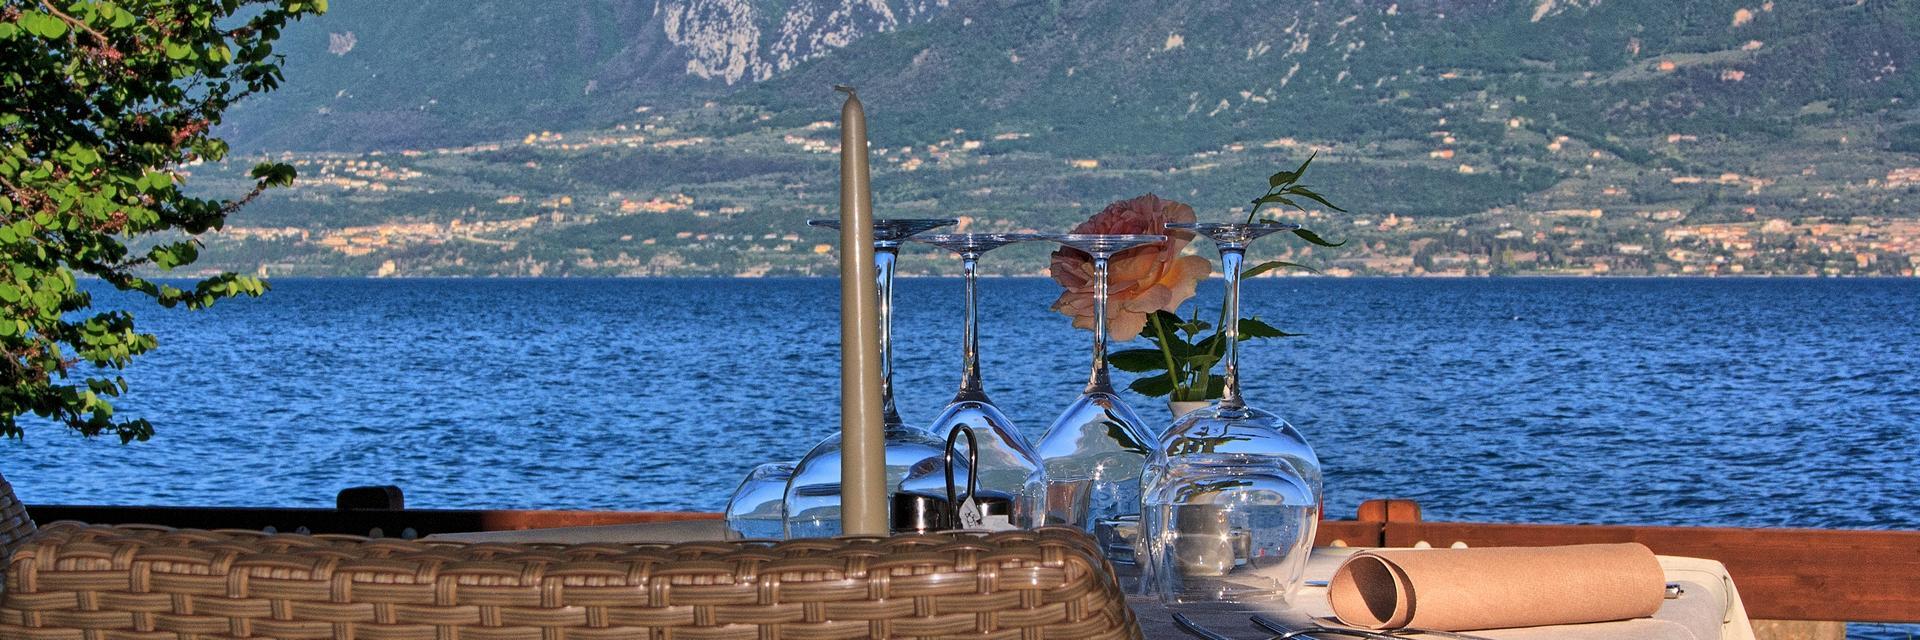 hotel-ristorante-menapace-torri-del-benaco-06.jpg